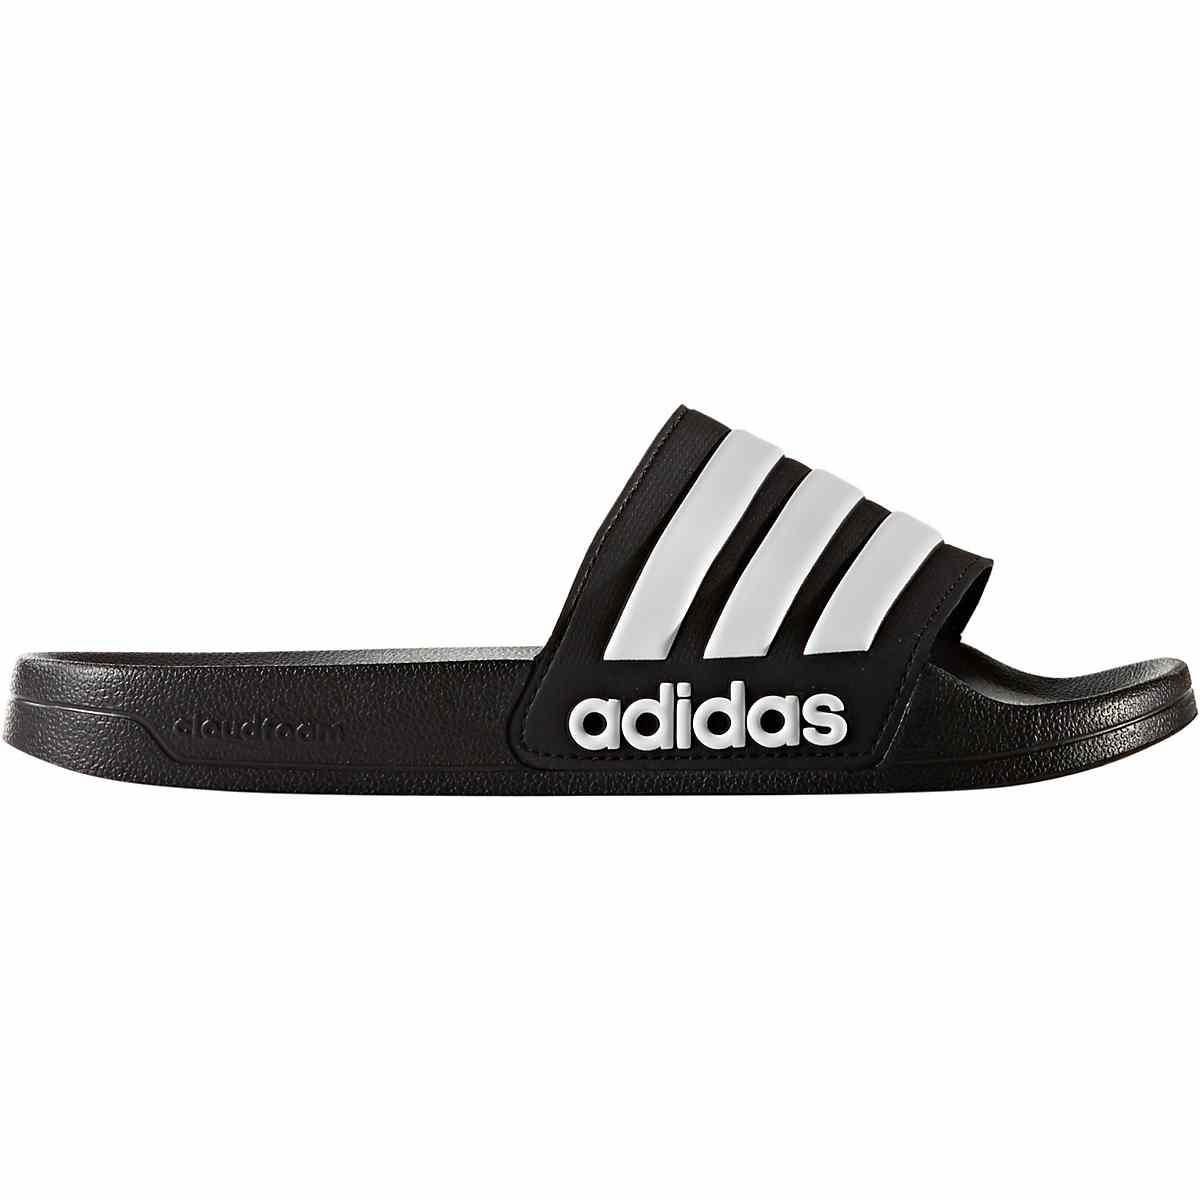 Under Armour Slide Sandals